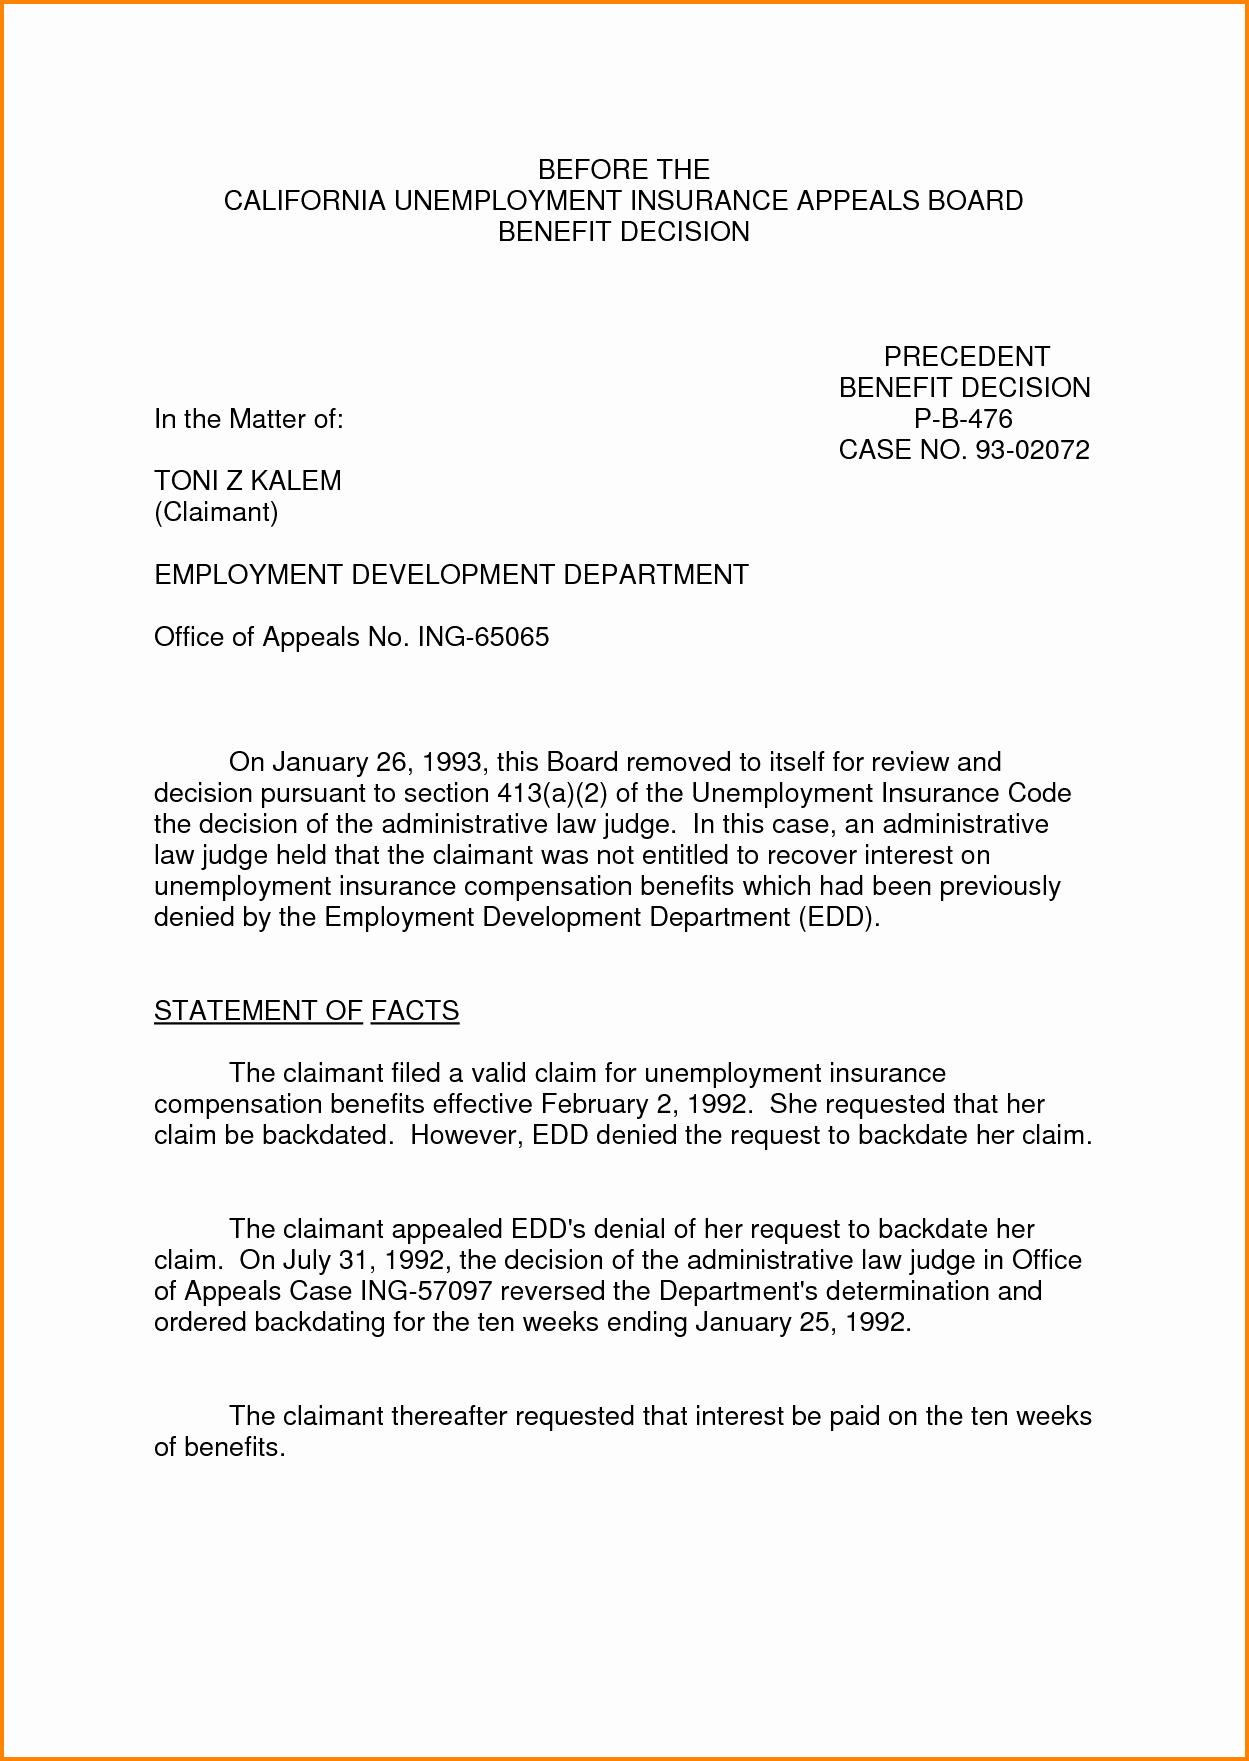 Letter Of Appeal format Inspirational 8 Sample Appeal Letter for Unemployment Denial